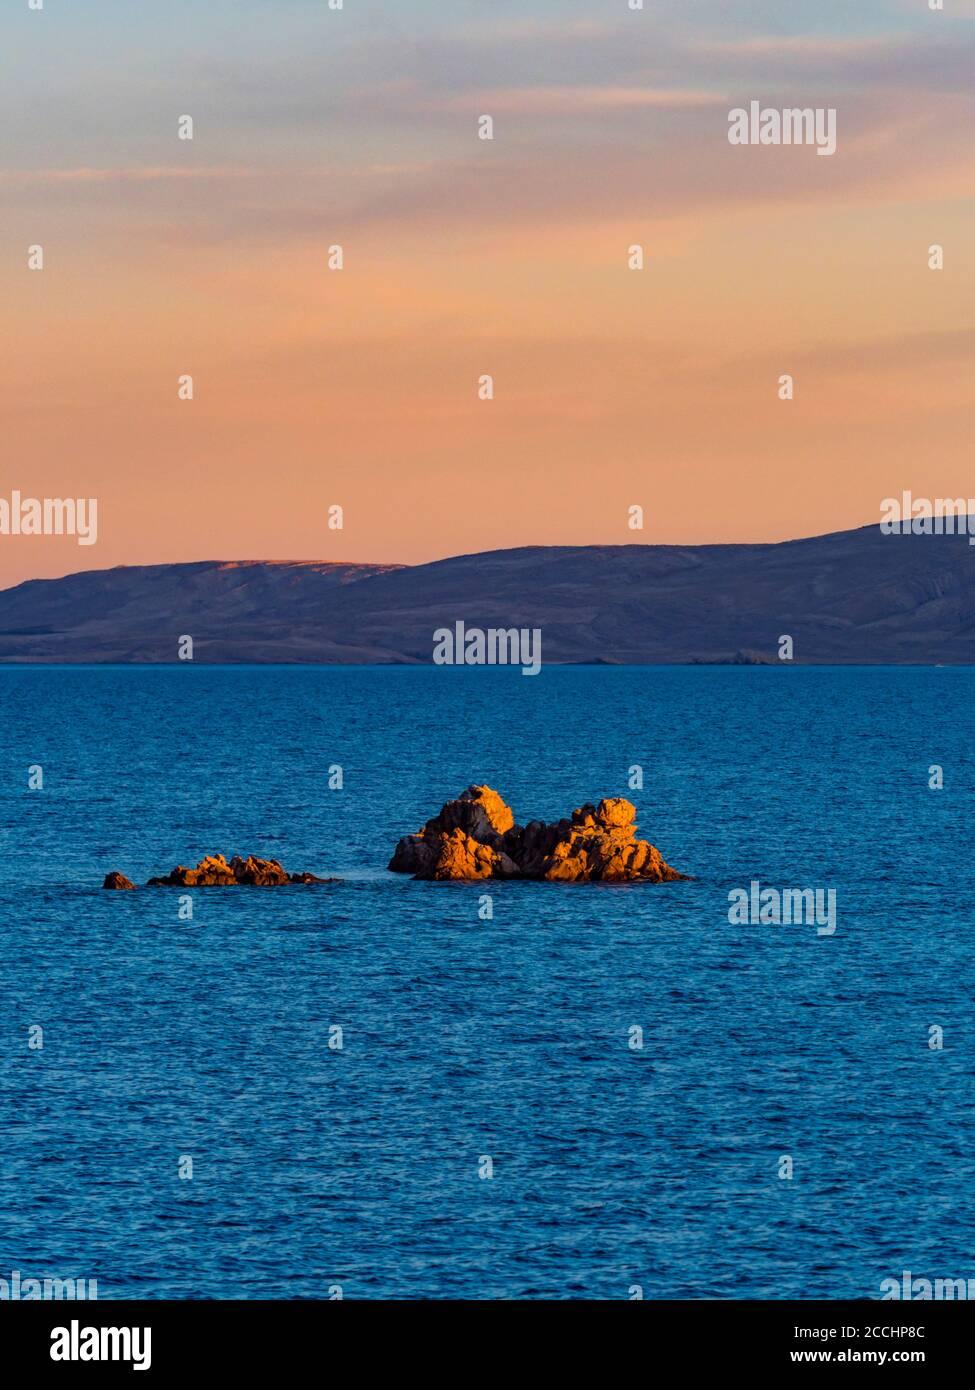 Evening scenery lonely small tiny rocky island before Ribarica near Karlobag in Croatia Europe Stock Photo